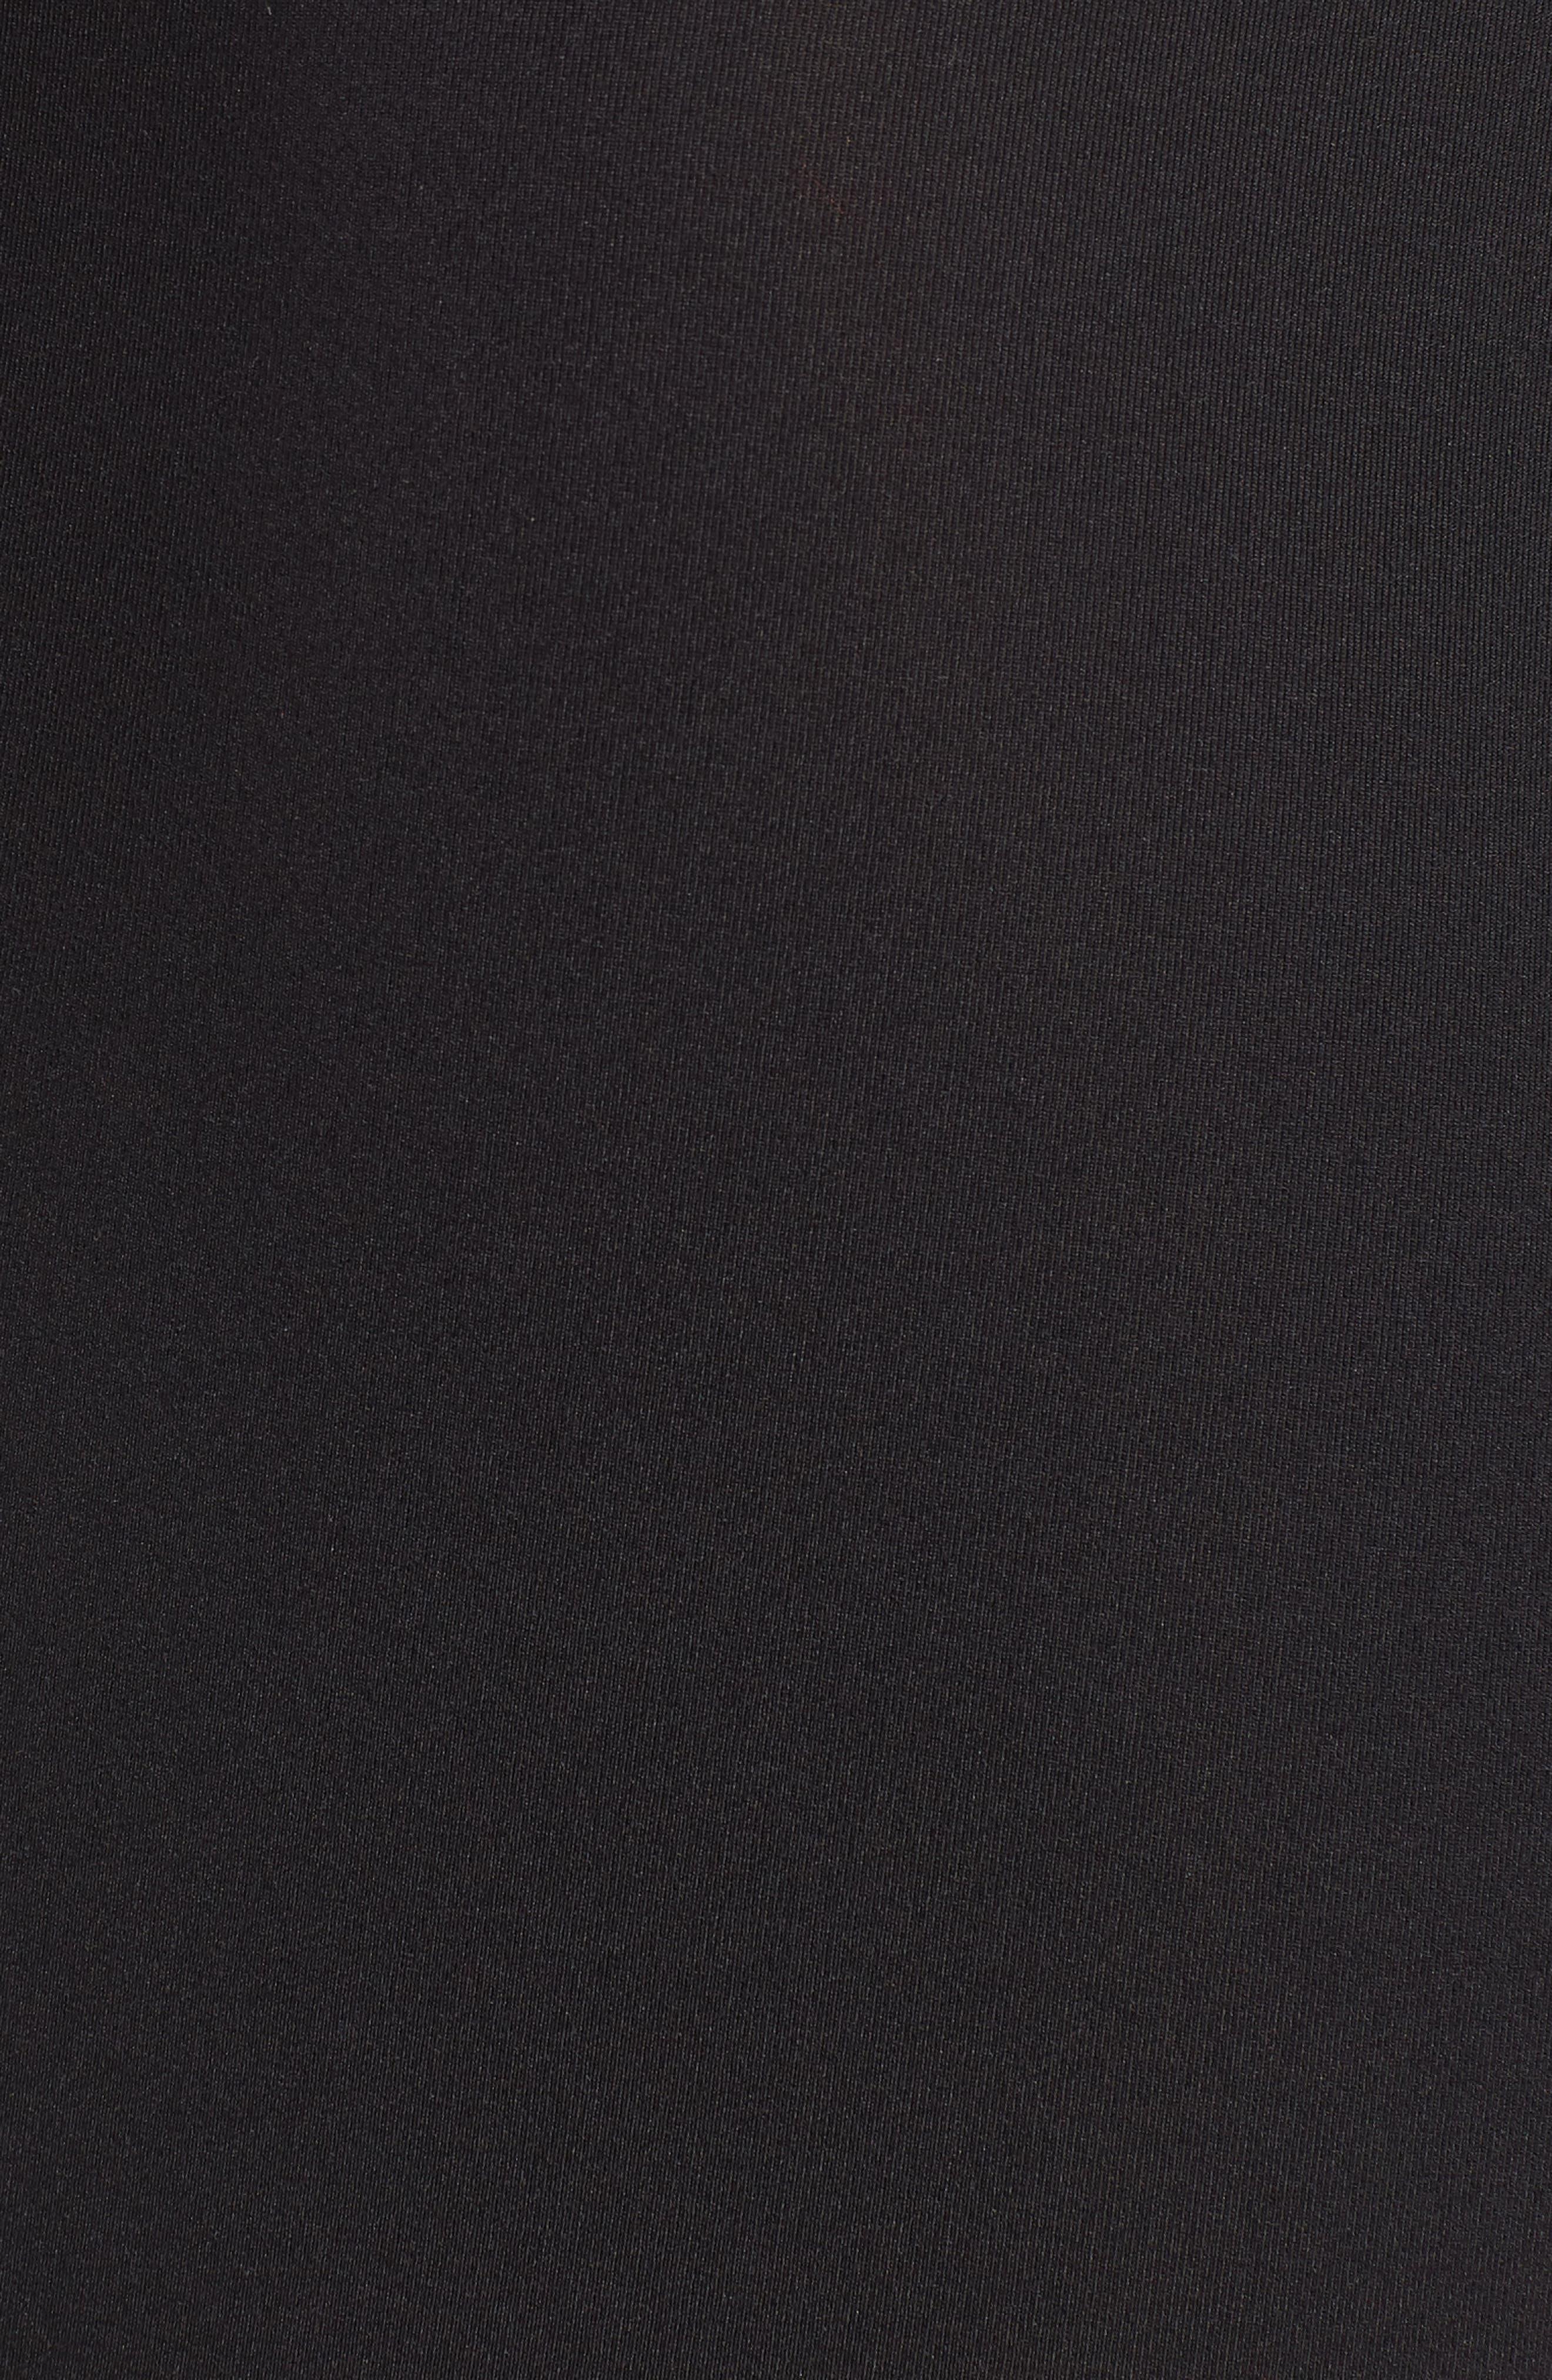 Low-Rise Trunks,                             Alternate thumbnail 5, color,                             001